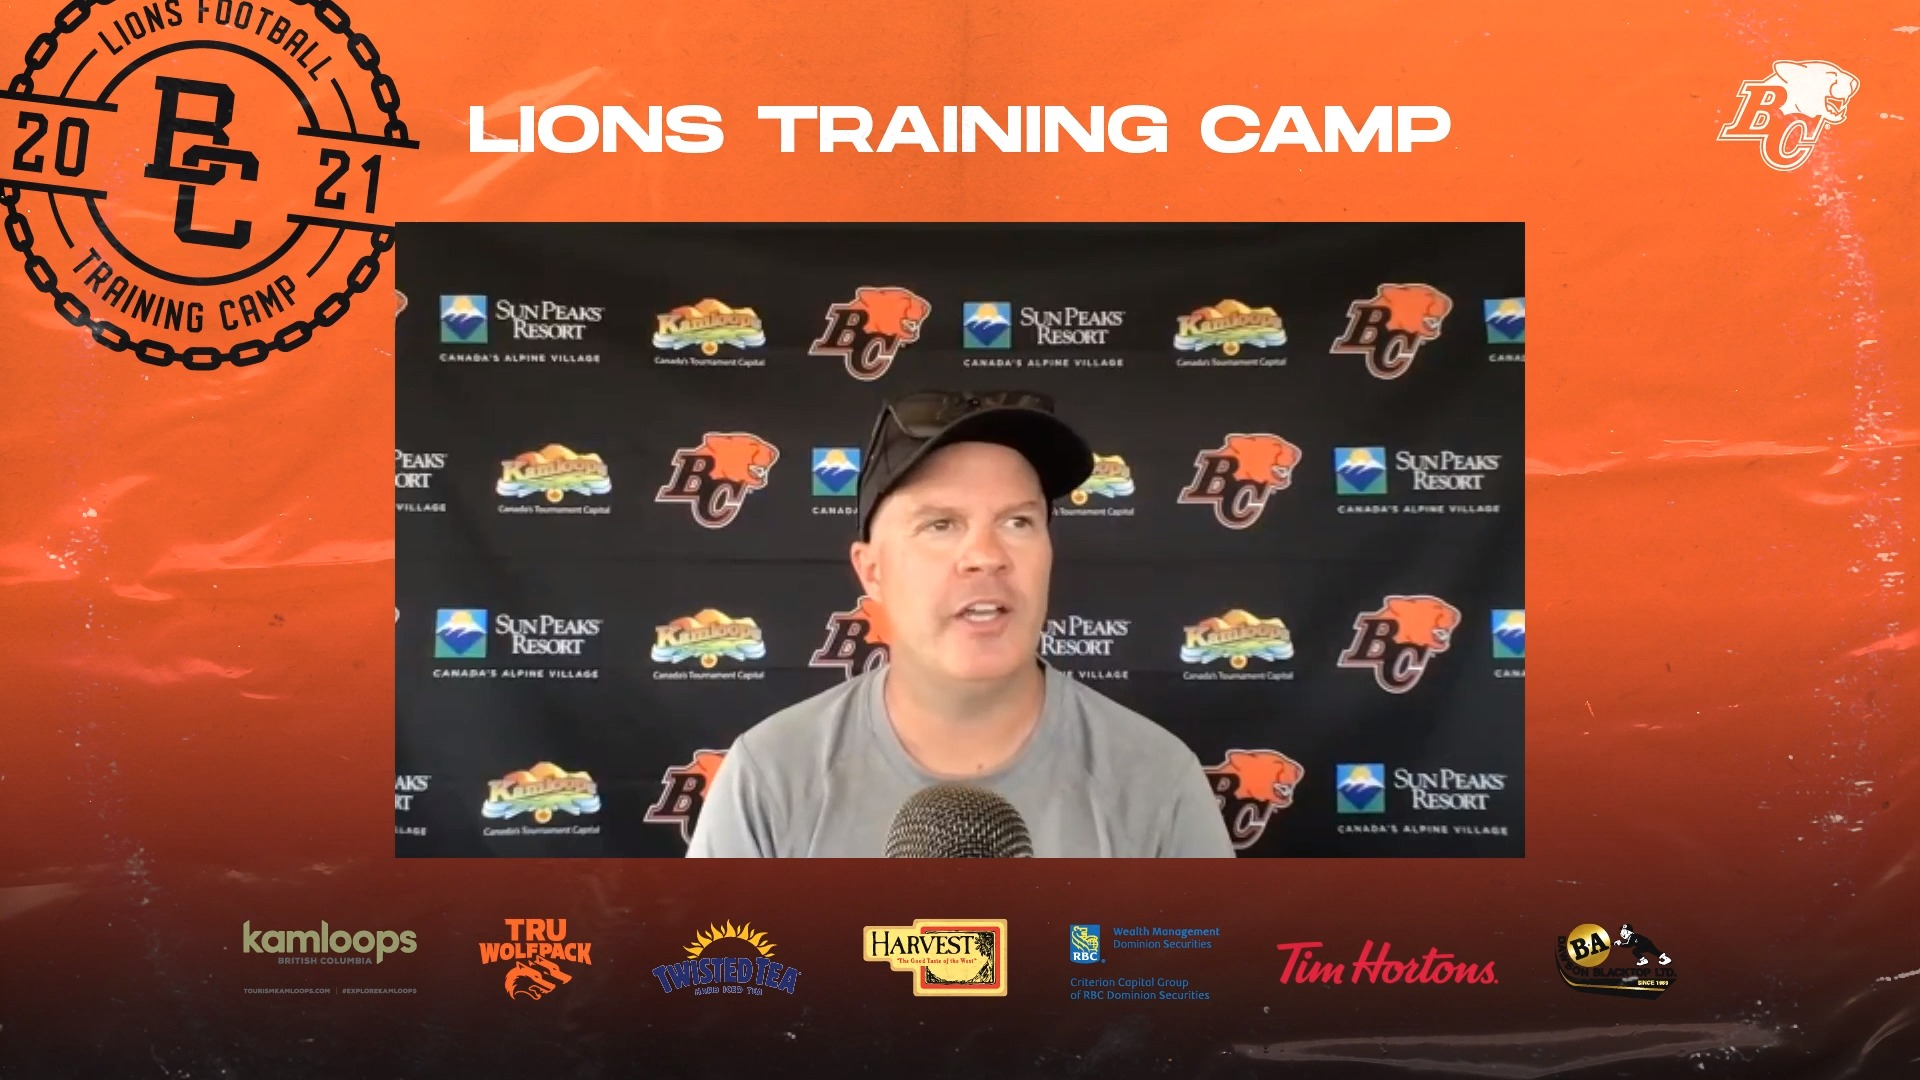 Training Camp July 21 | Rick Campbell